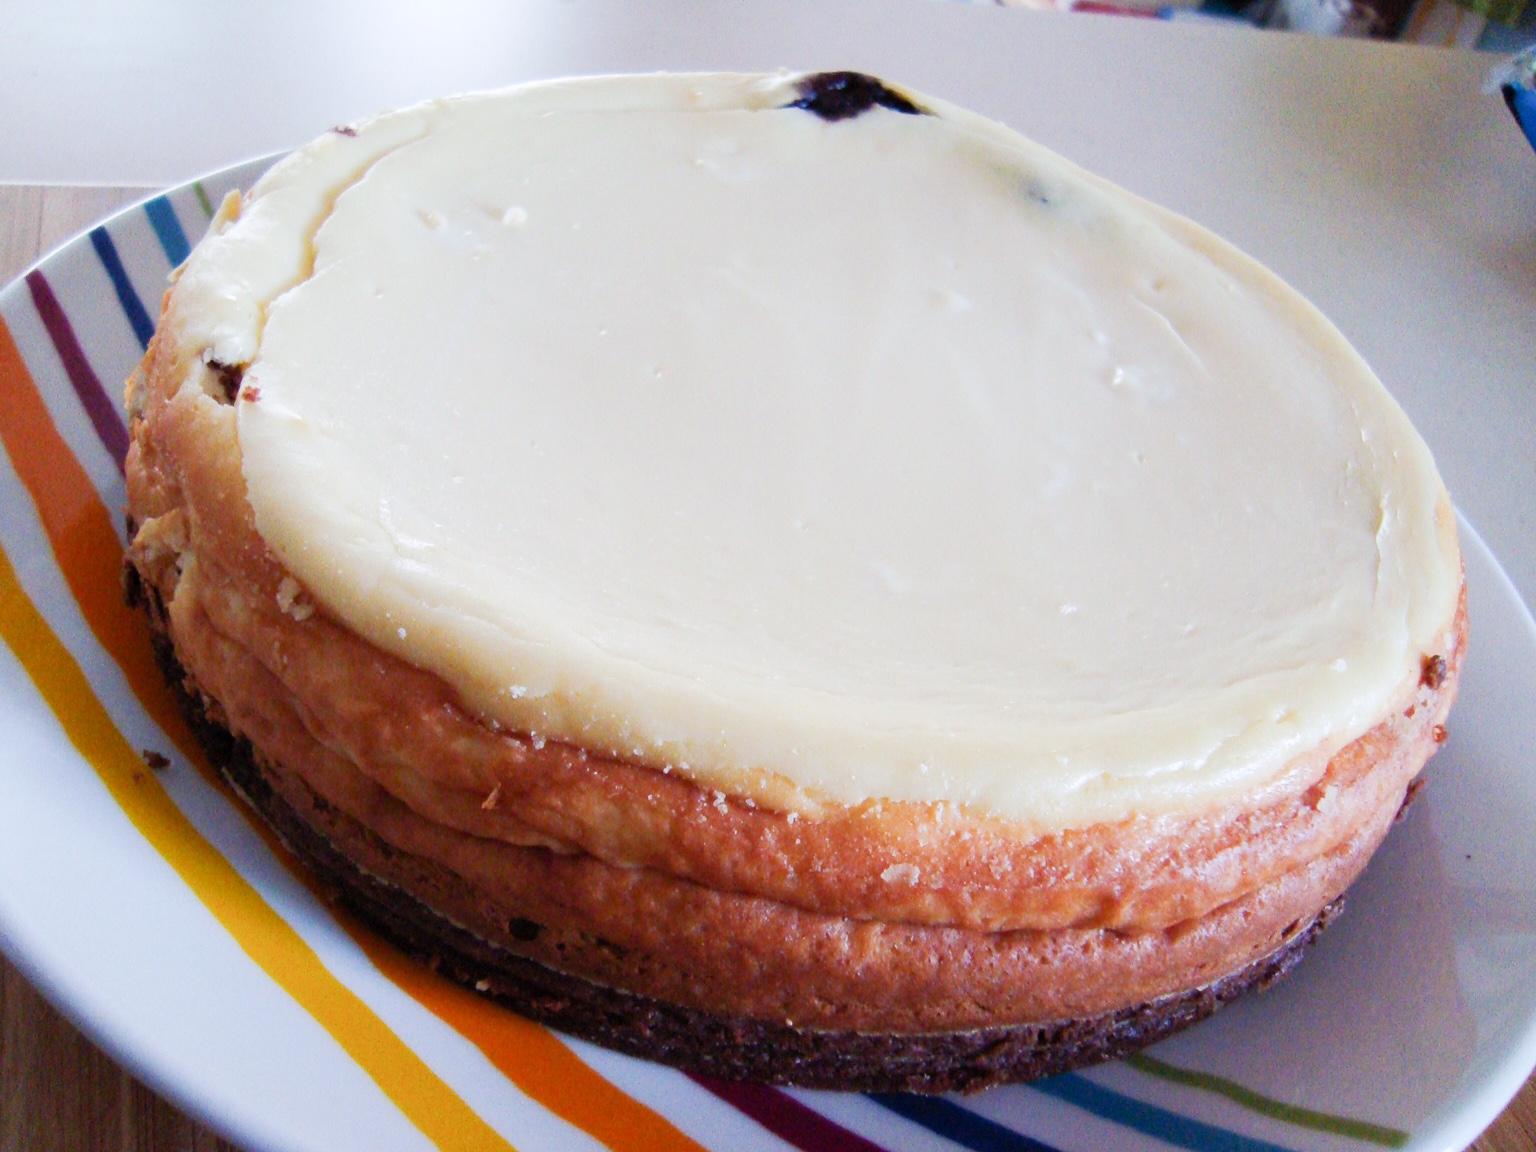 #2 Brownie Bottom Cheesecake - www.SweetDashofSass.com